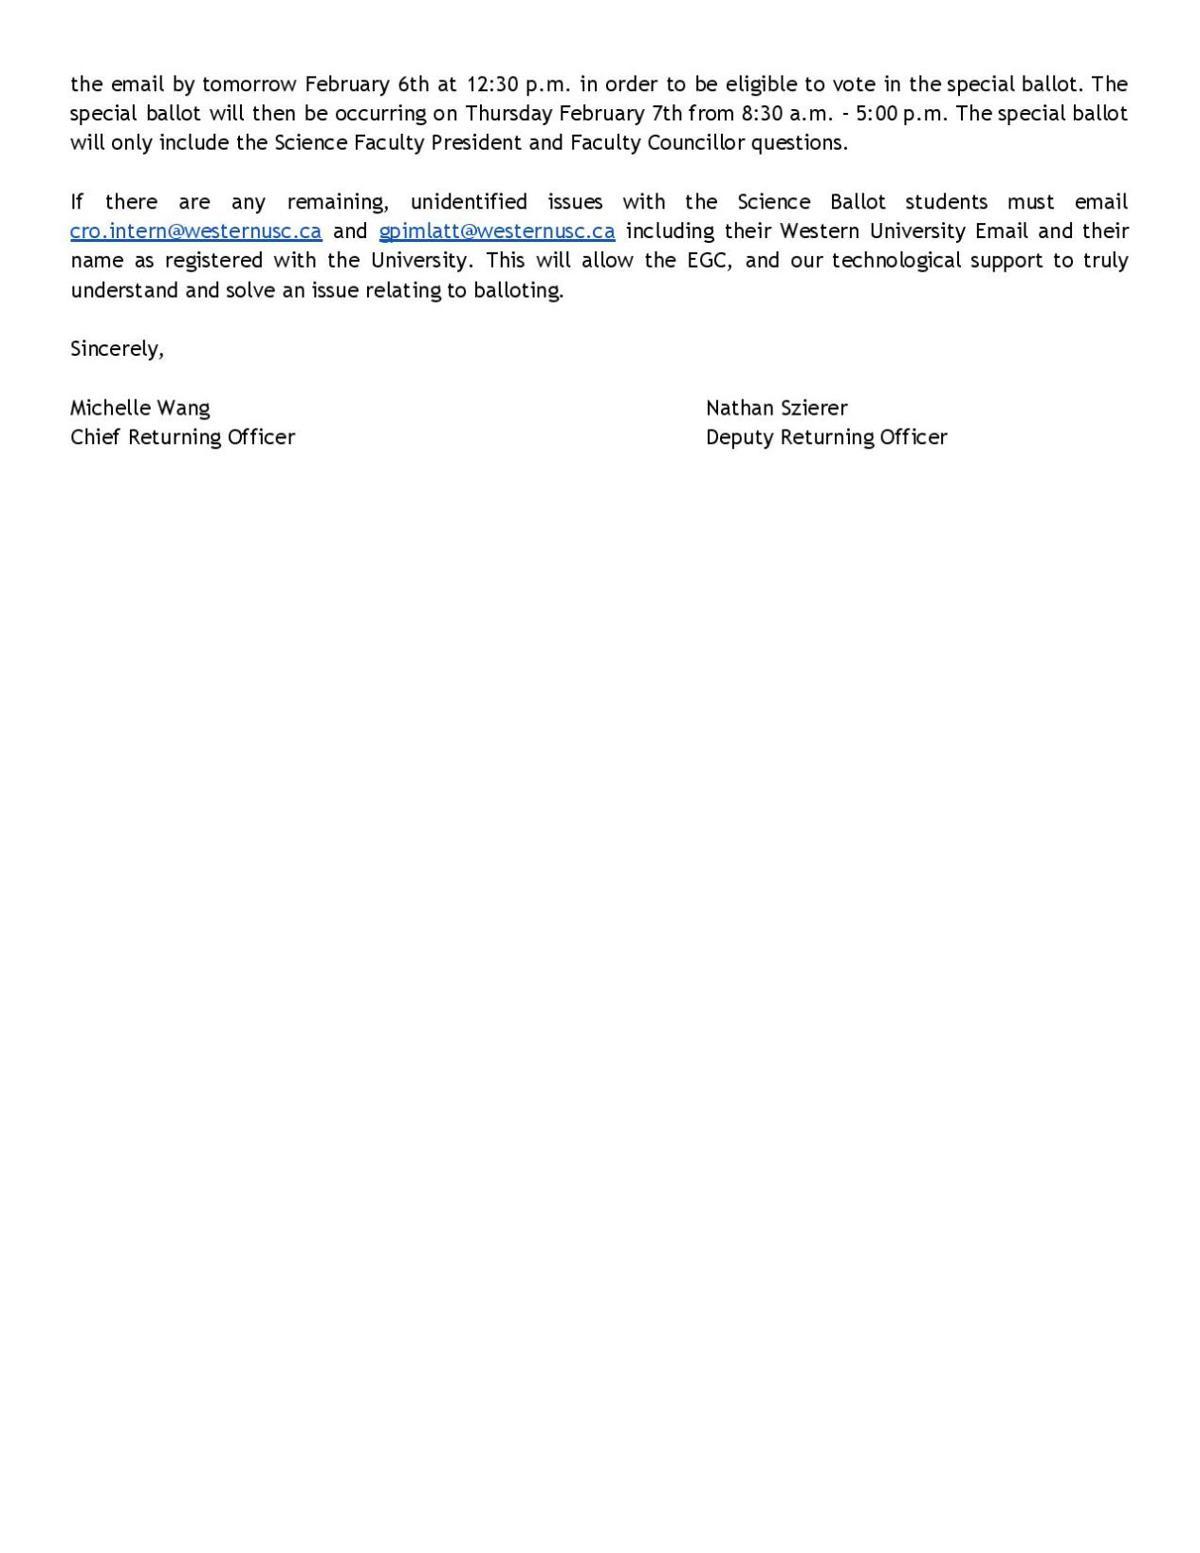 EGC response Feb. 5, two